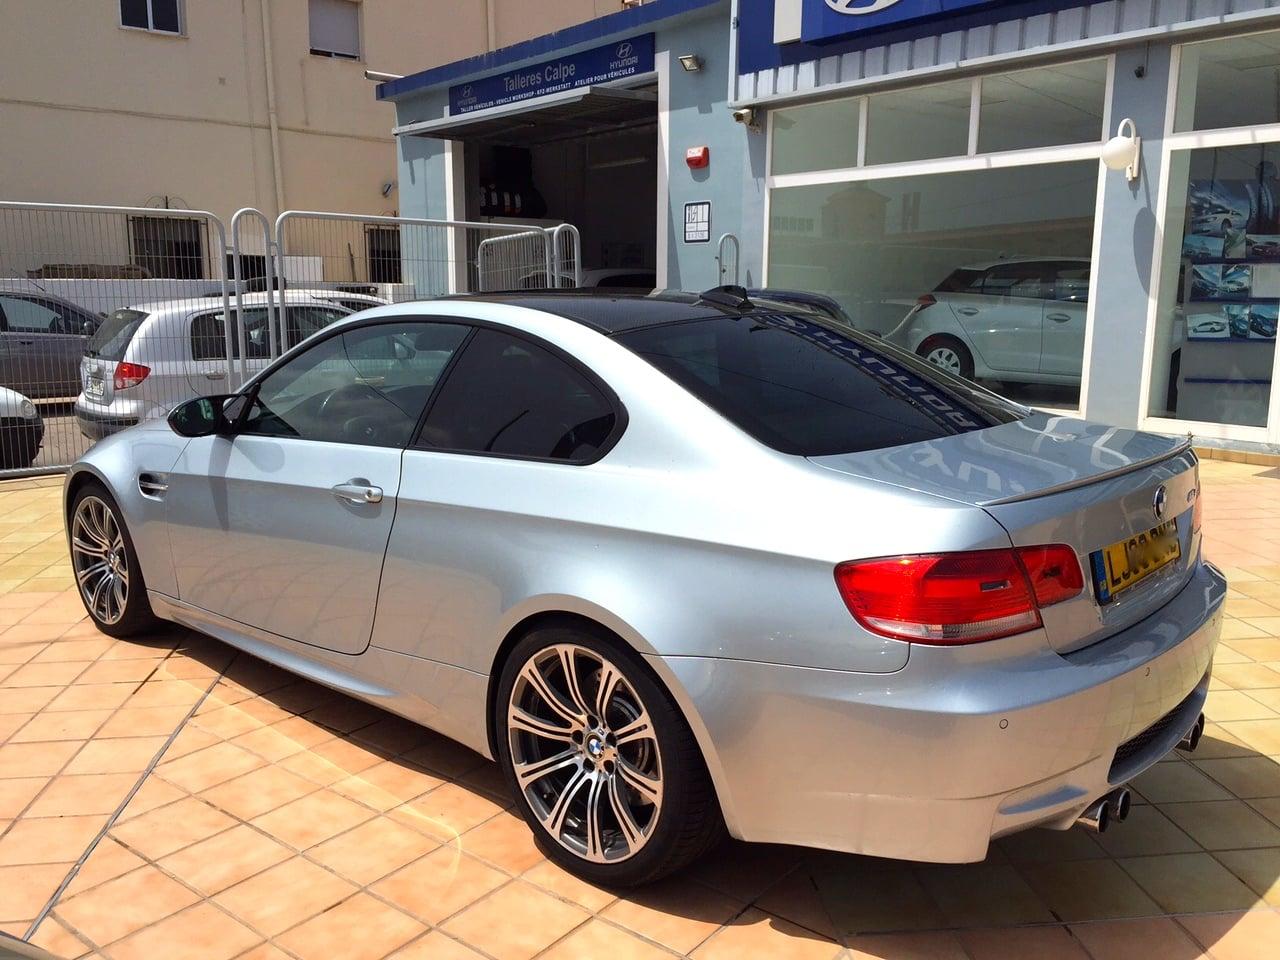 C4 On The Go >> BMW M3 V8 New Model - LHD BMW M3 in Spain